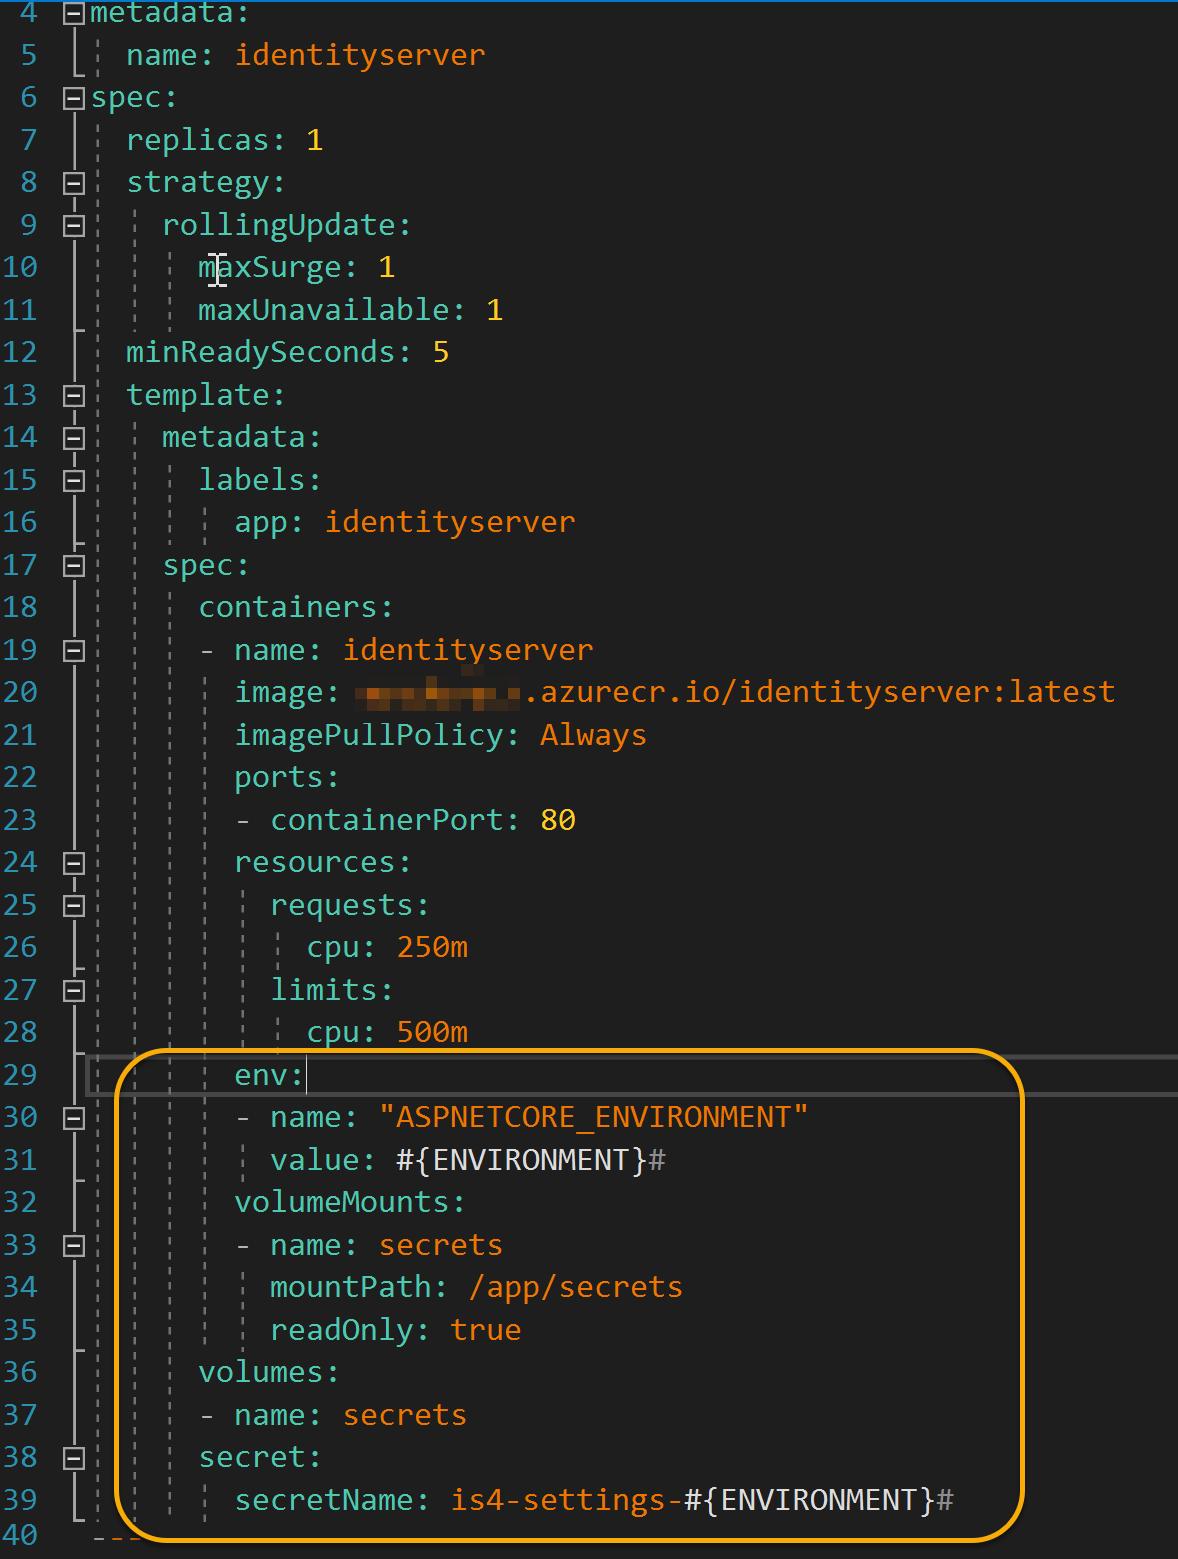 DevOps Friday: Build a deployment pipeline using K8s secrets